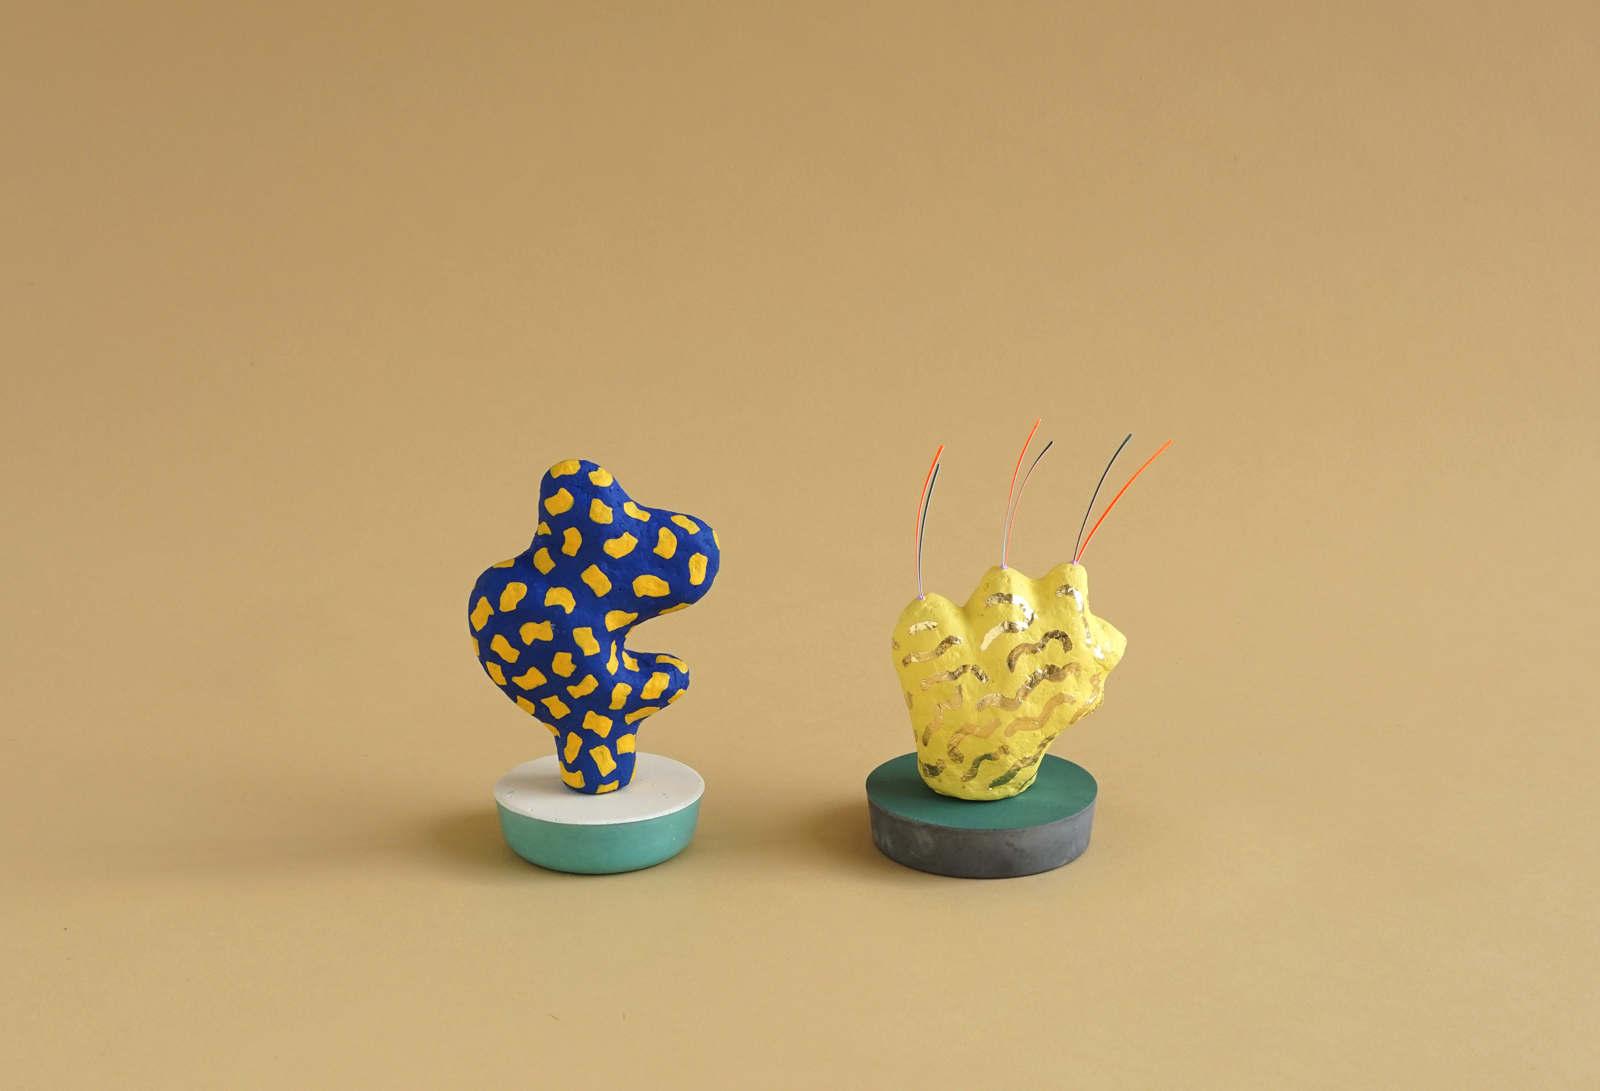 The Cartoon Plant Sculptures - Adam Frezza & Terri Chiao